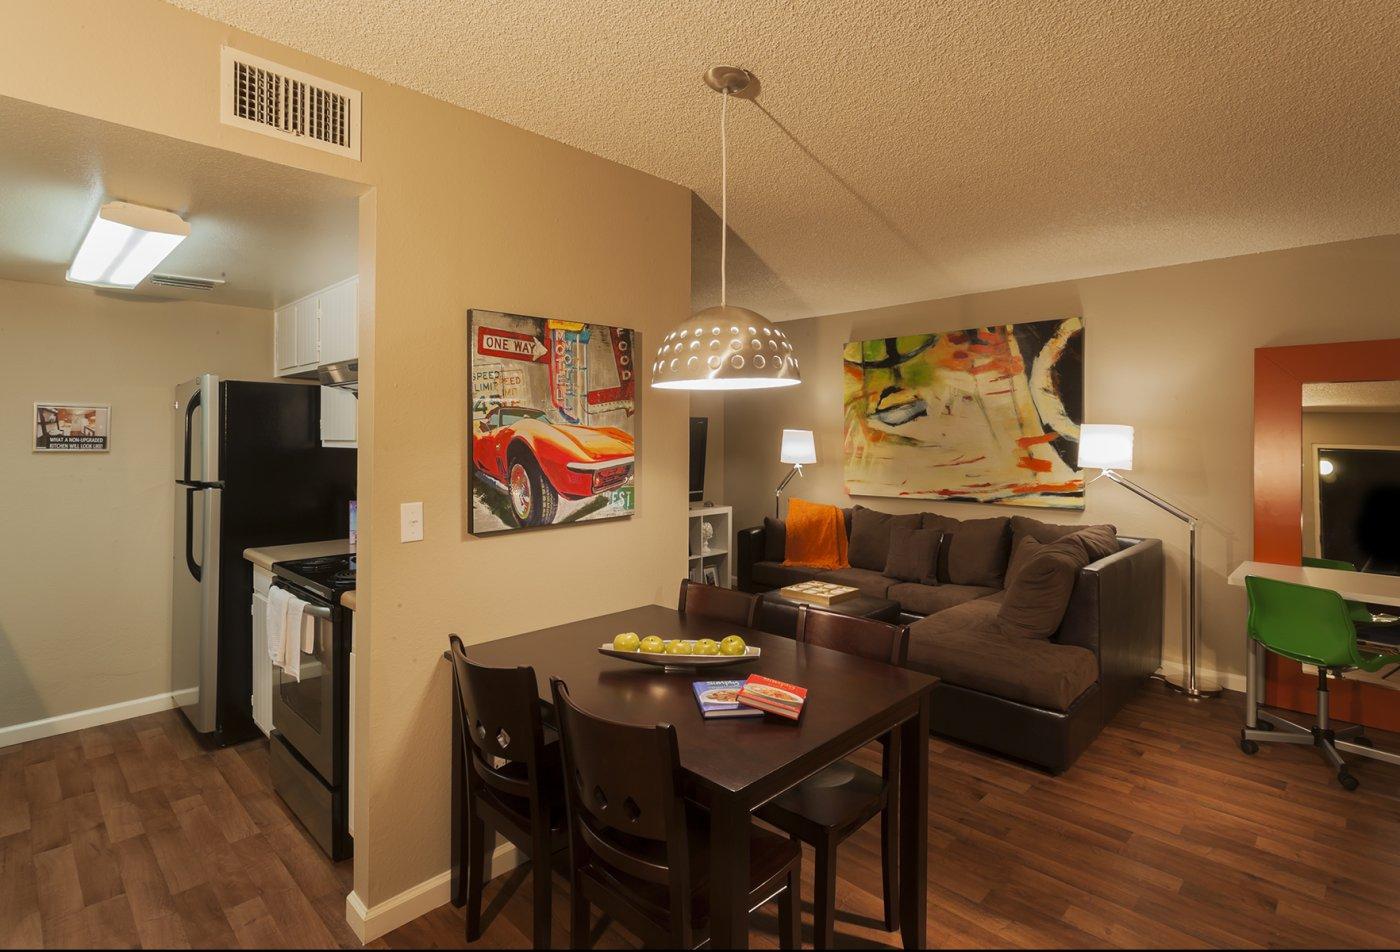 Apartments for rent in tucson az zona verde apartments zona verde apartments tucson az for 3 bedroom apartments tucson az